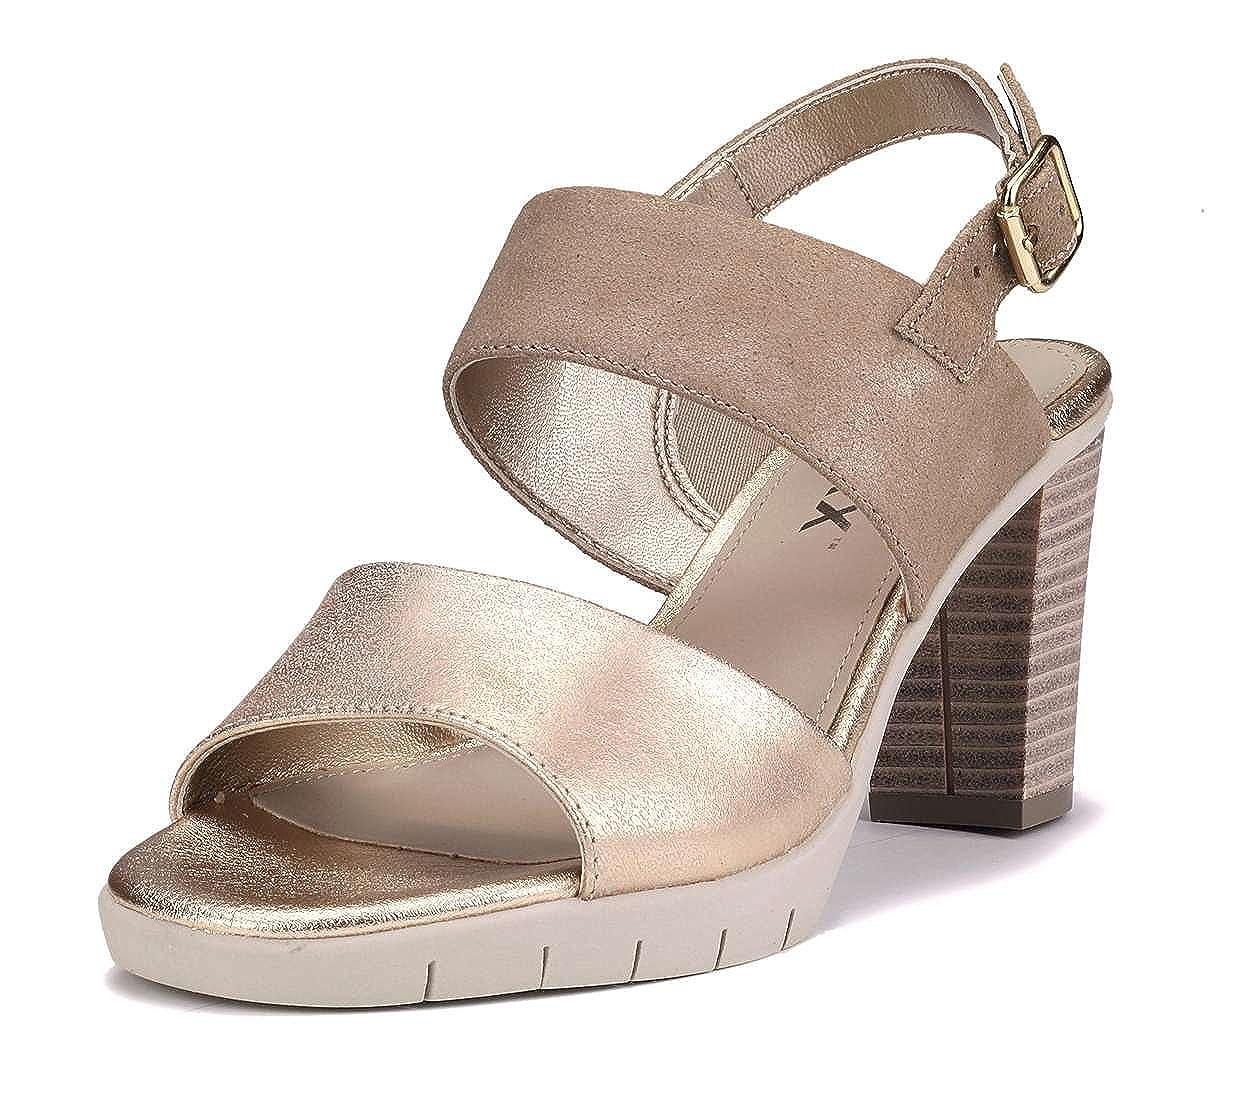 The FLEXX Yu N Me Sandalo Tacco Donna  Gold/Dune